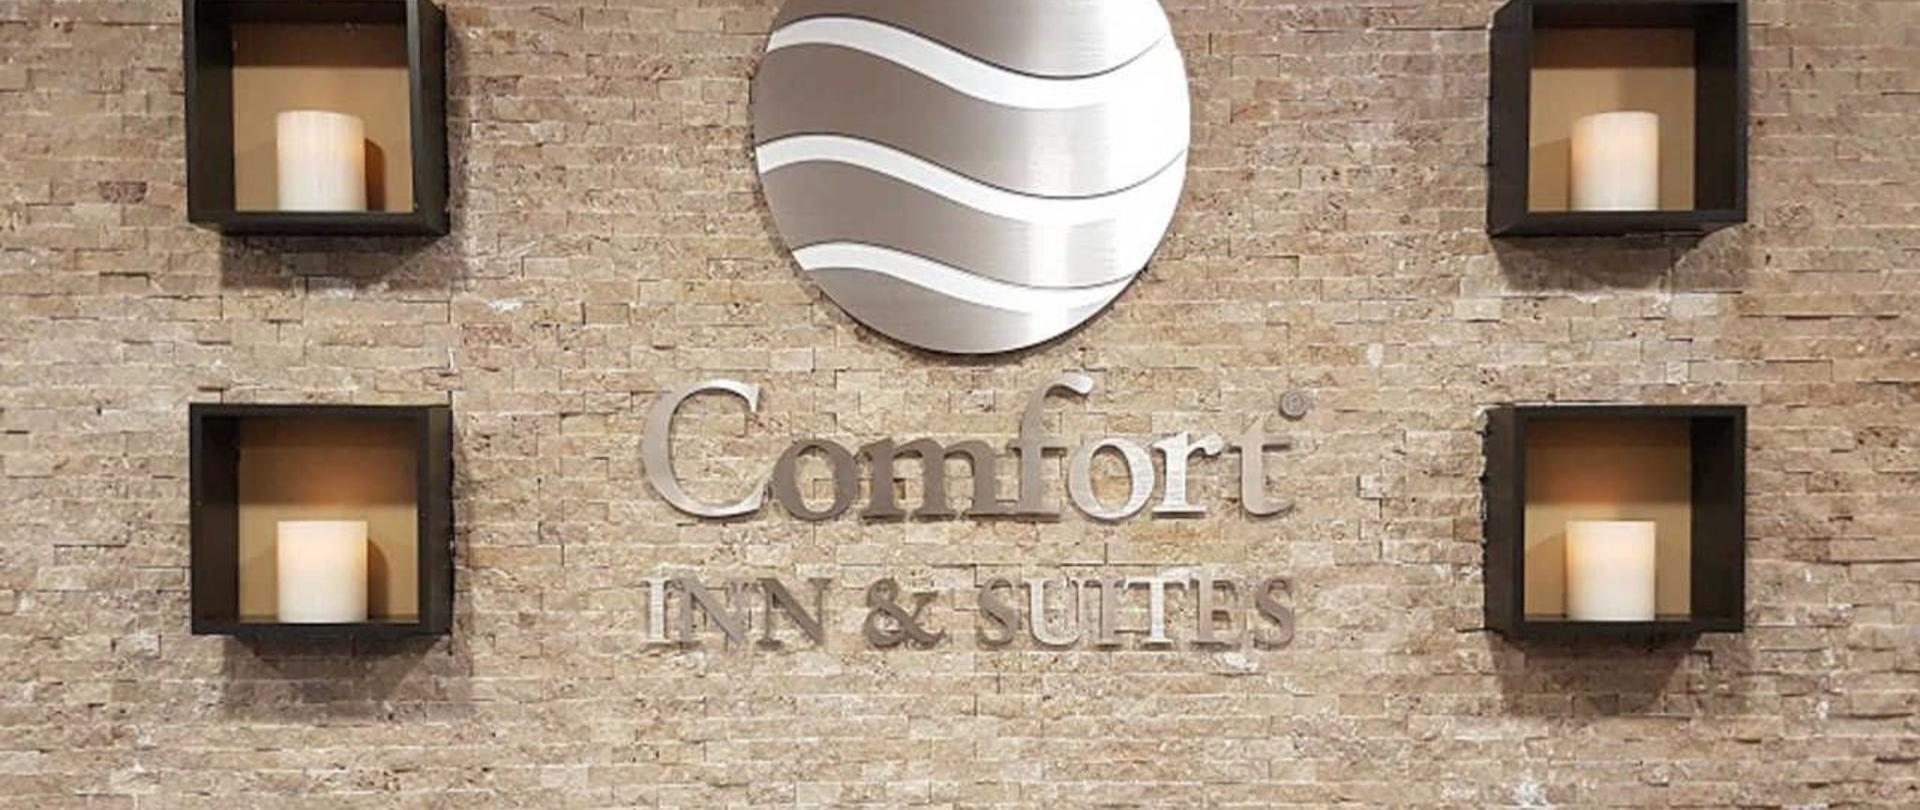 comfort-inn-suites-terrace-3.jpg